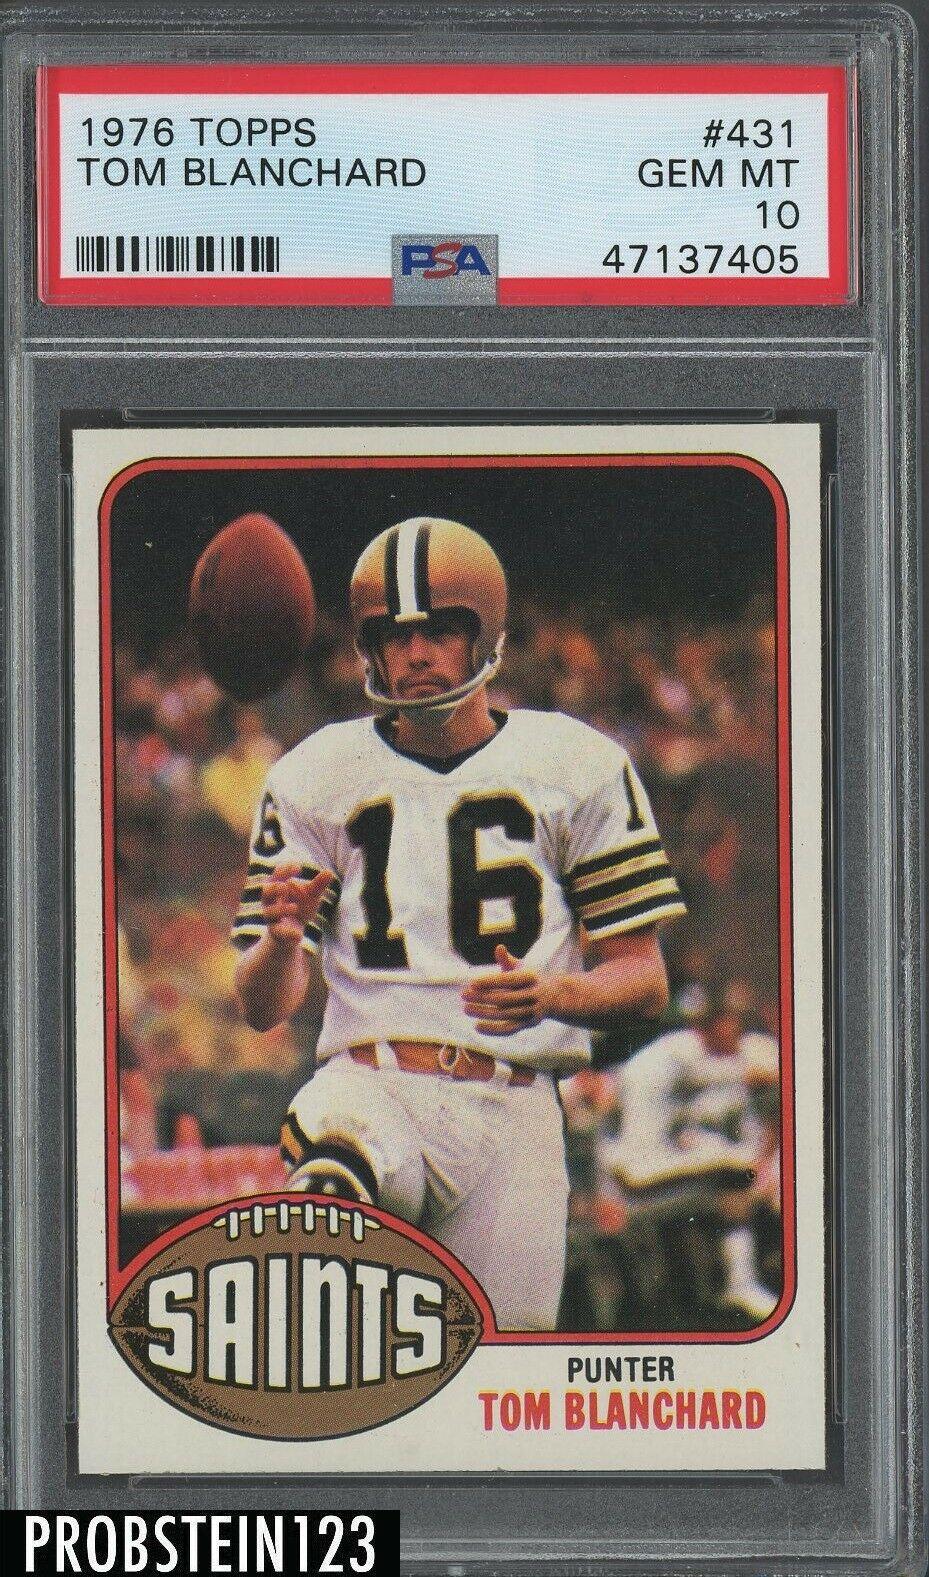 1976 Topps Football 431 Tom Blanchard New Orleans Saints PSA 10 GEM MINT